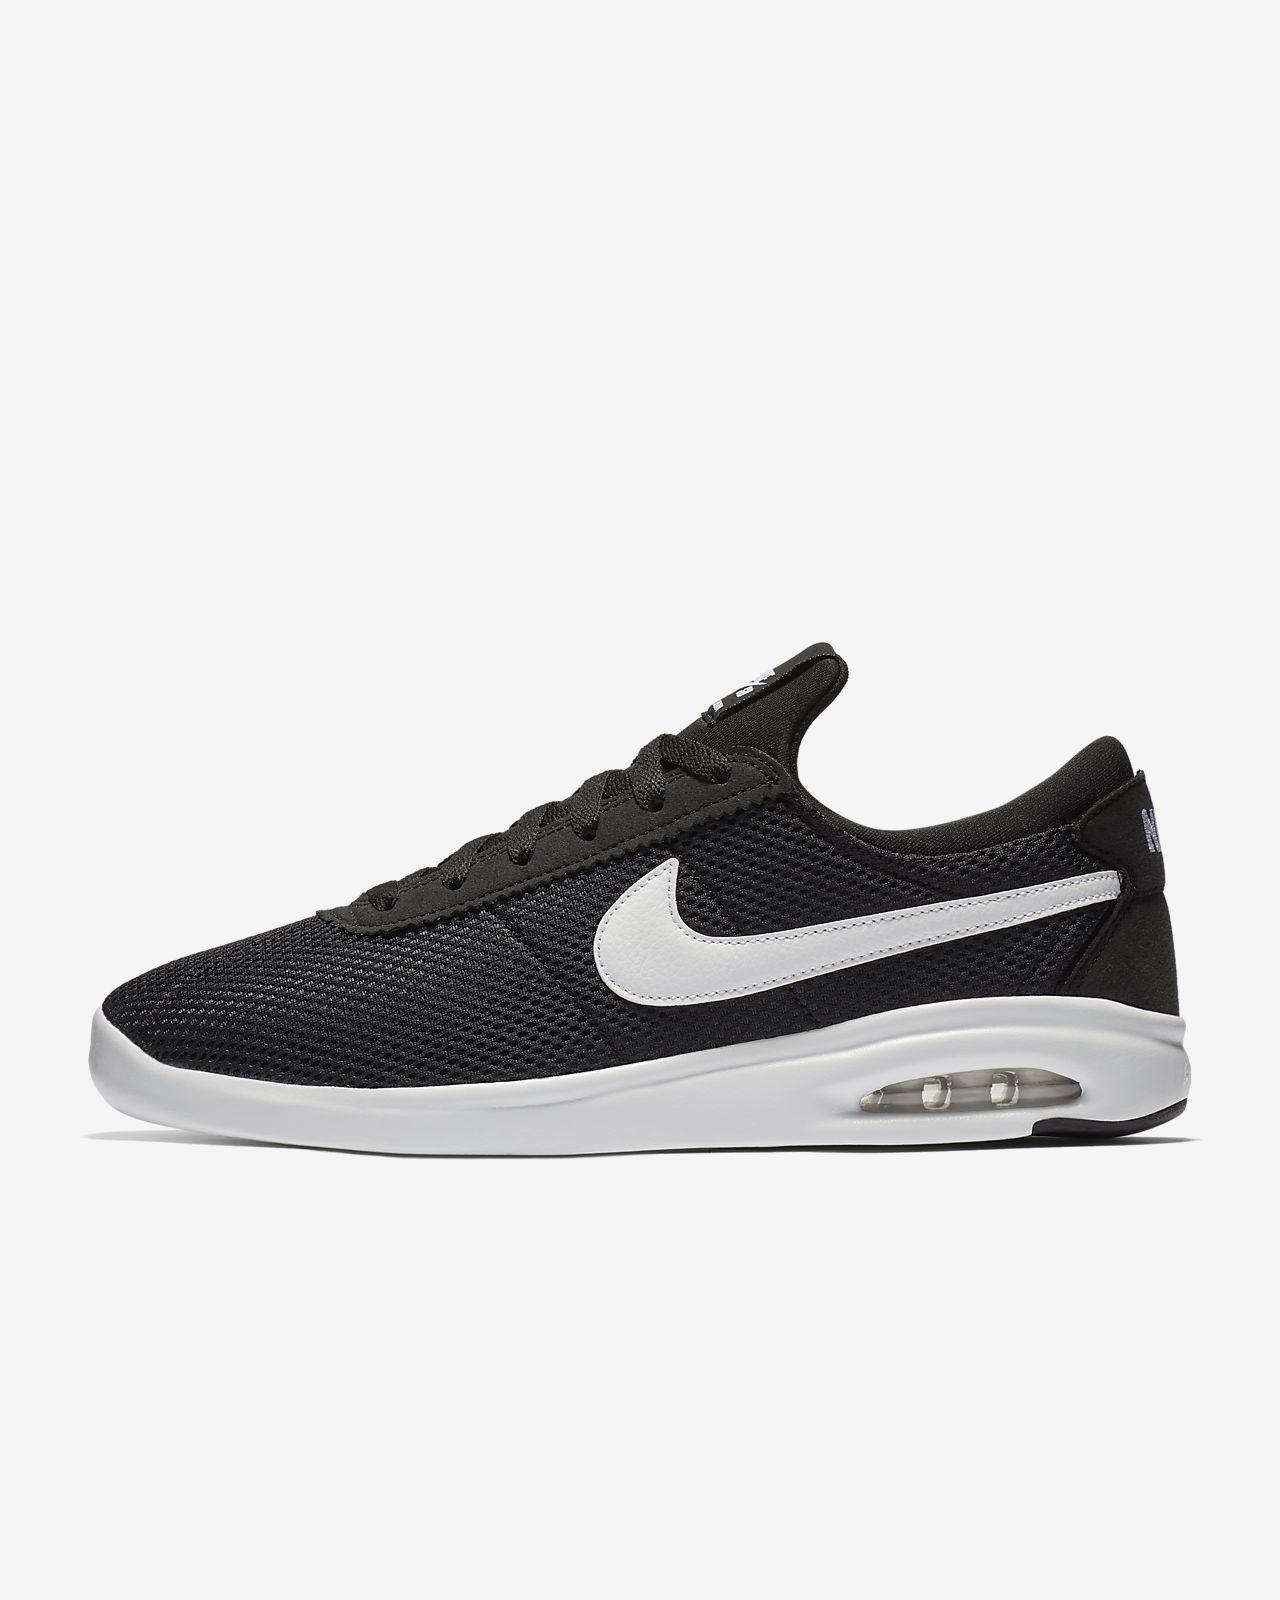 850926799afd40 Nike SB Air Max Bruin Vapor Men s Skate Shoe. Nike.com GB